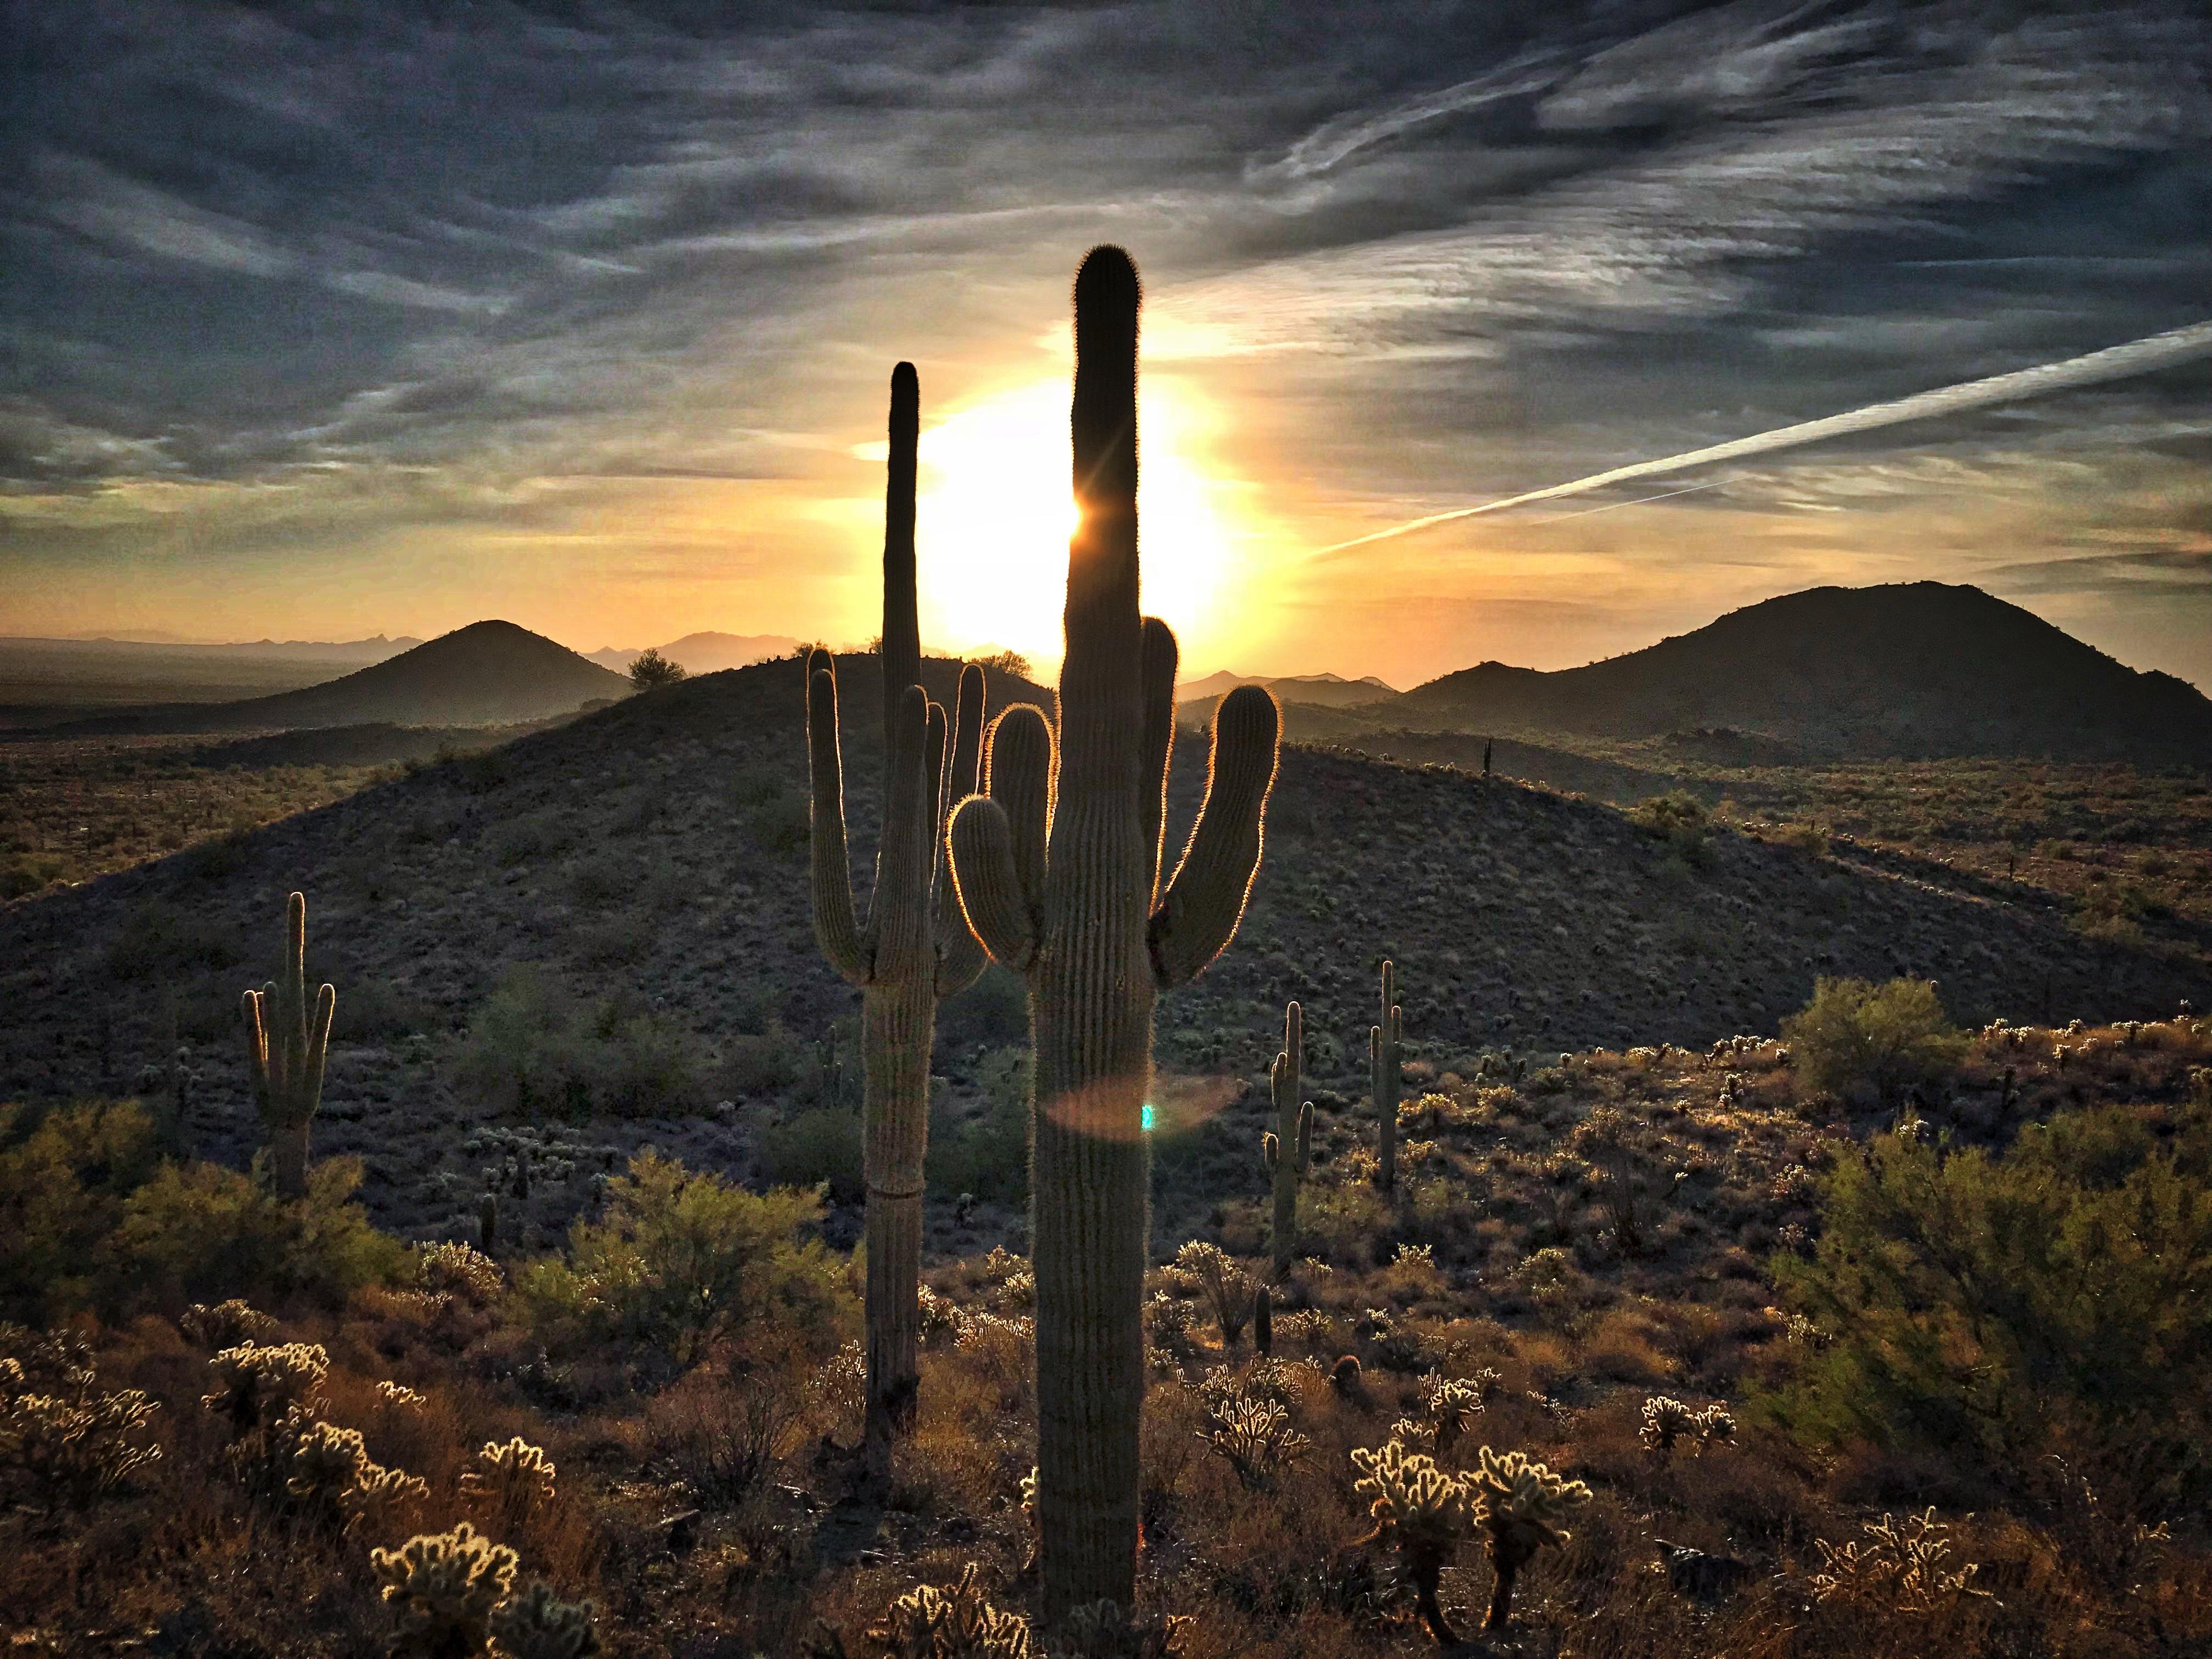 Desert Cactus Sunrise Sky Landscape Cloud Dawn Evening Sunset Tree Mountain Meteorological Phenomenon Ecoregion Horizon Hill